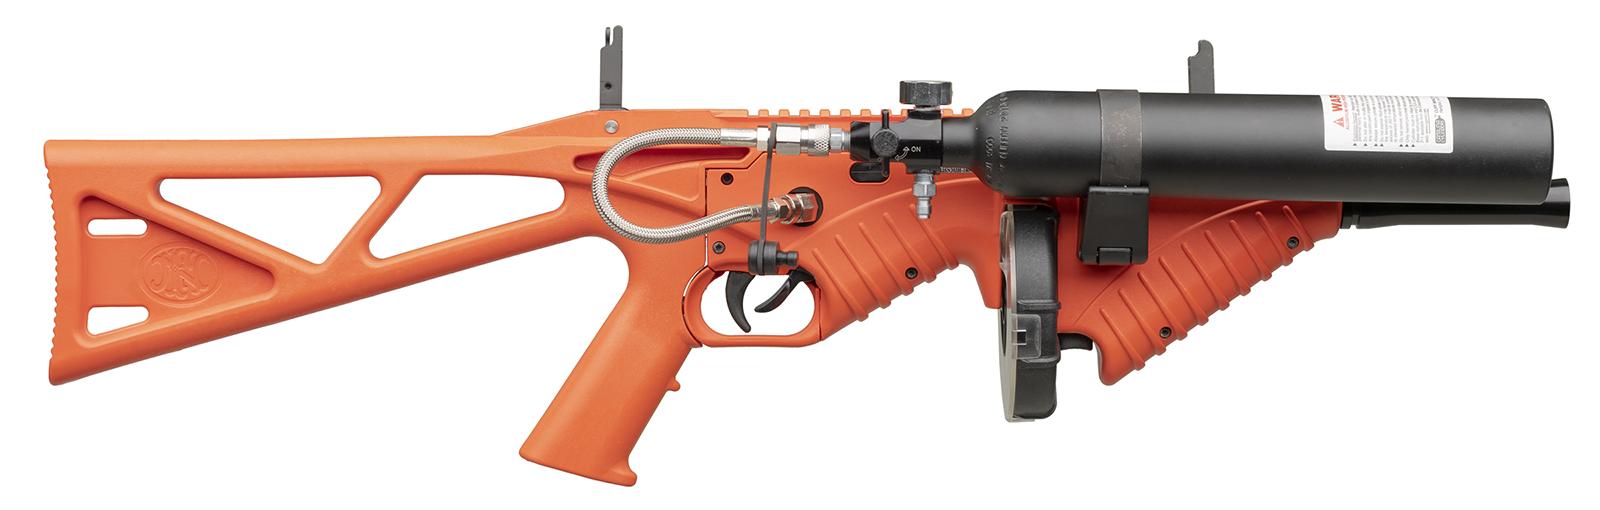 FN 303® Mk2